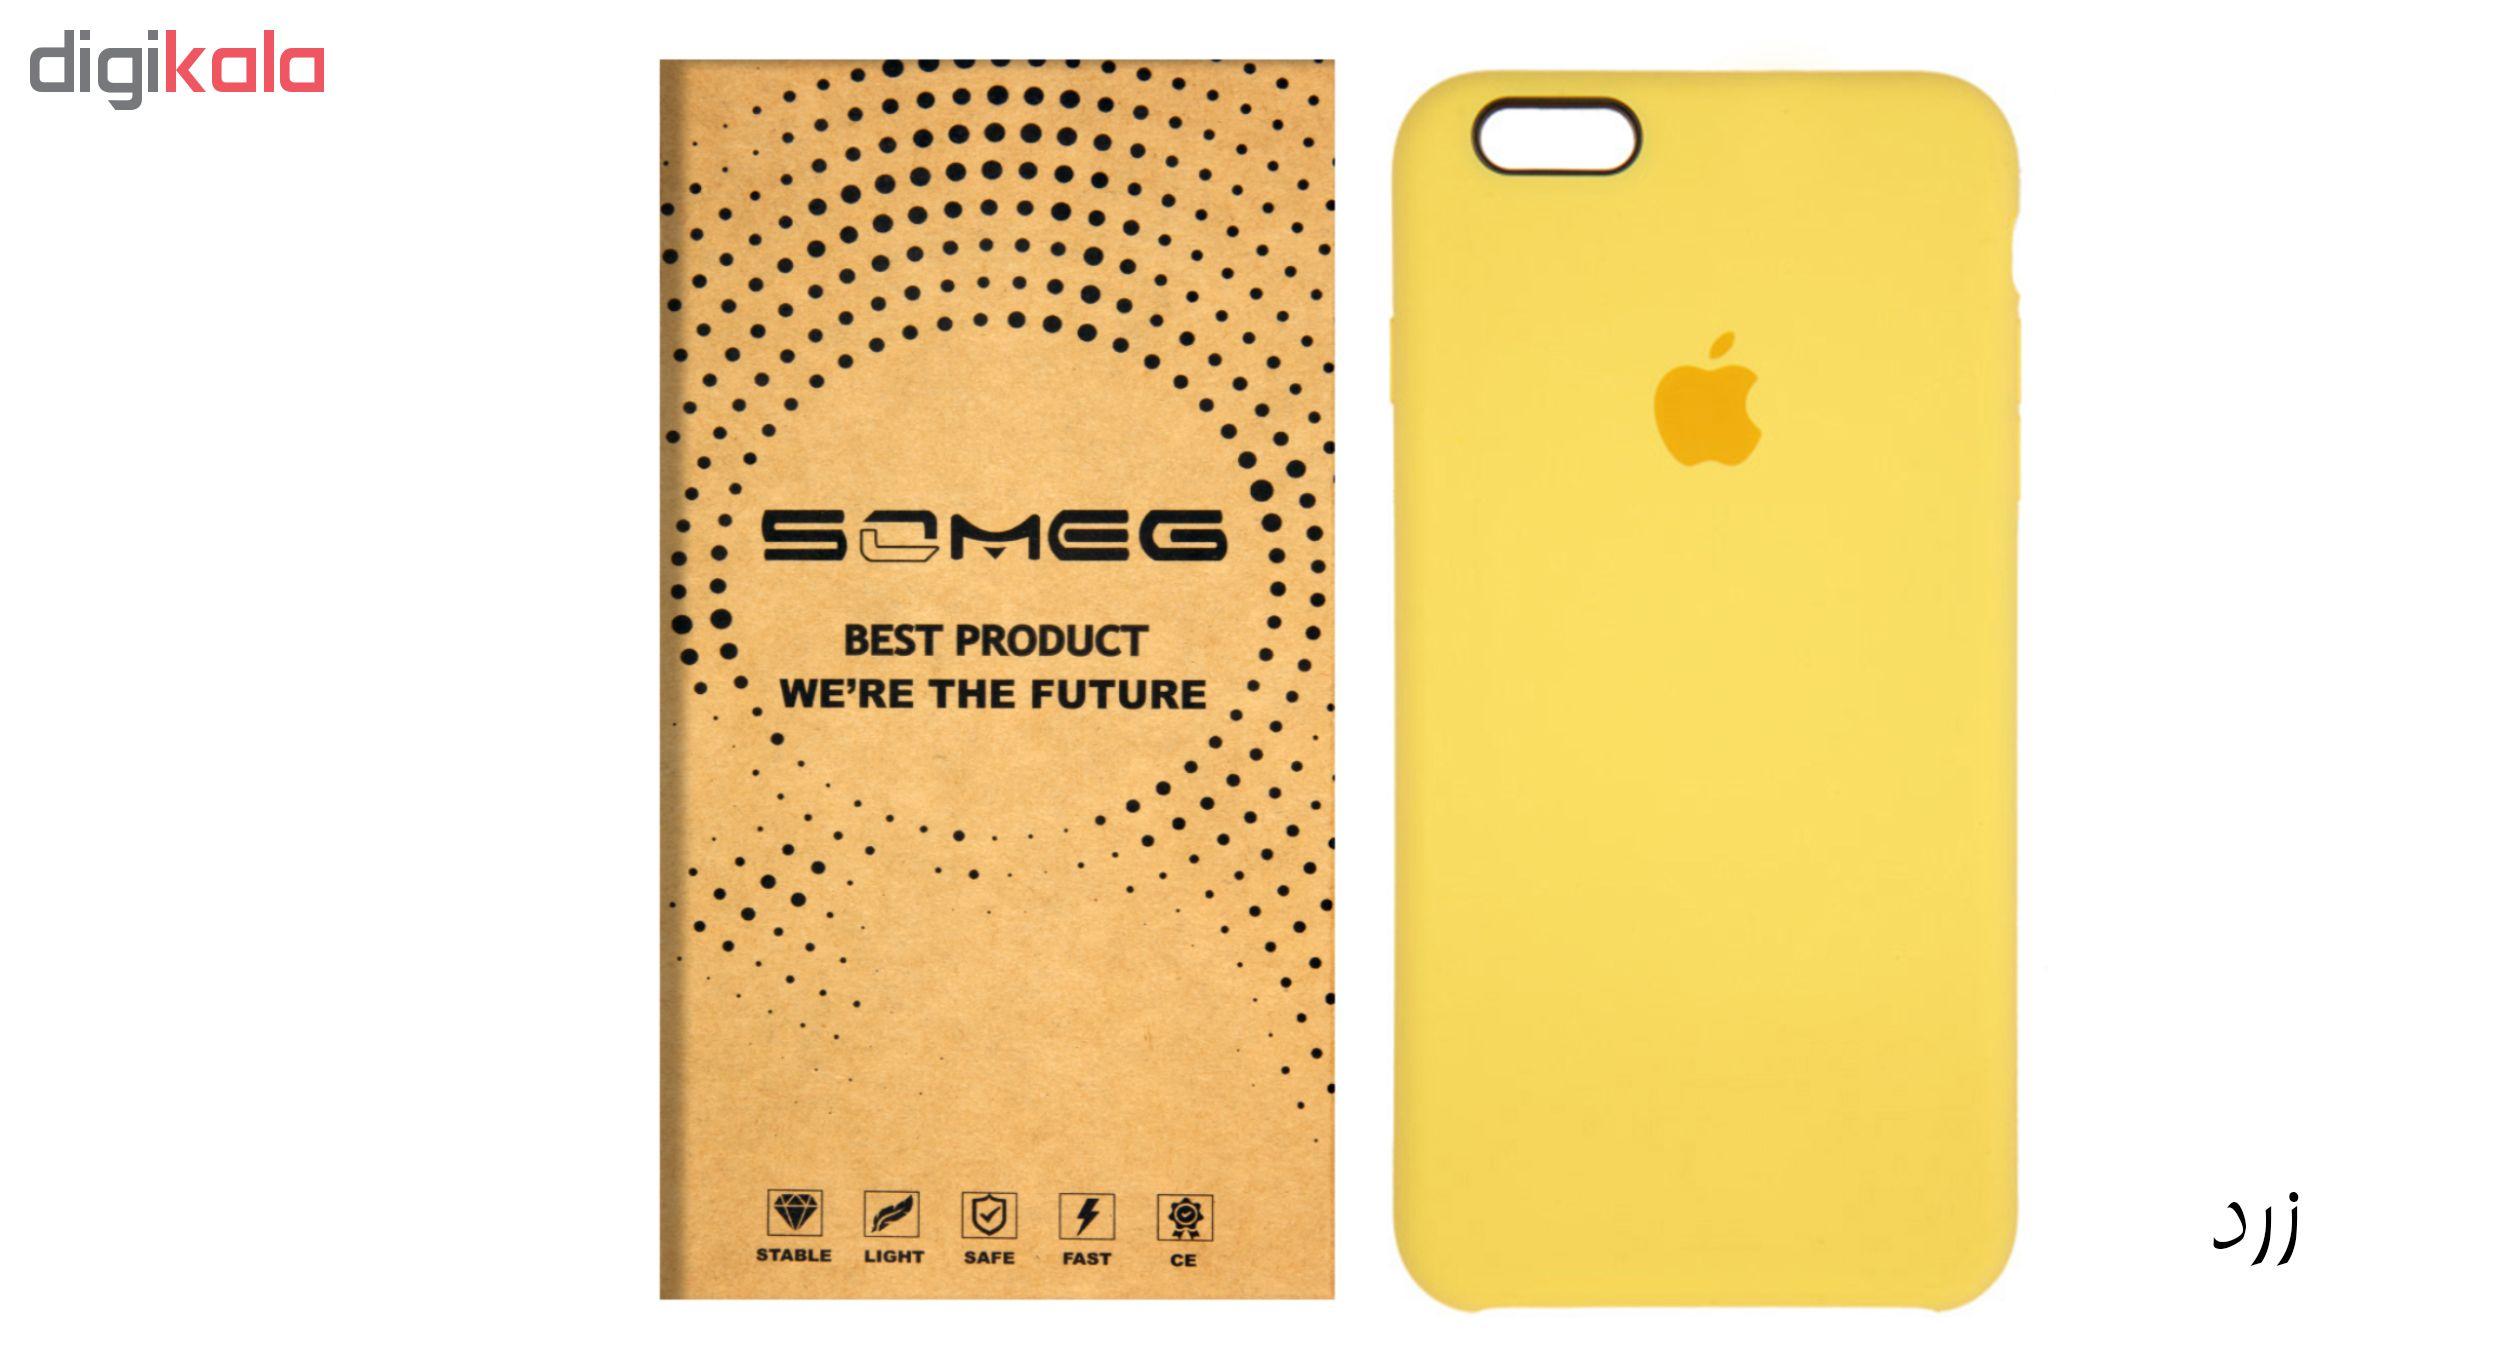 کاور سومگ مدل SIC مناسب برای گوشی موبایل اپل iPhone 6/6s main 1 21